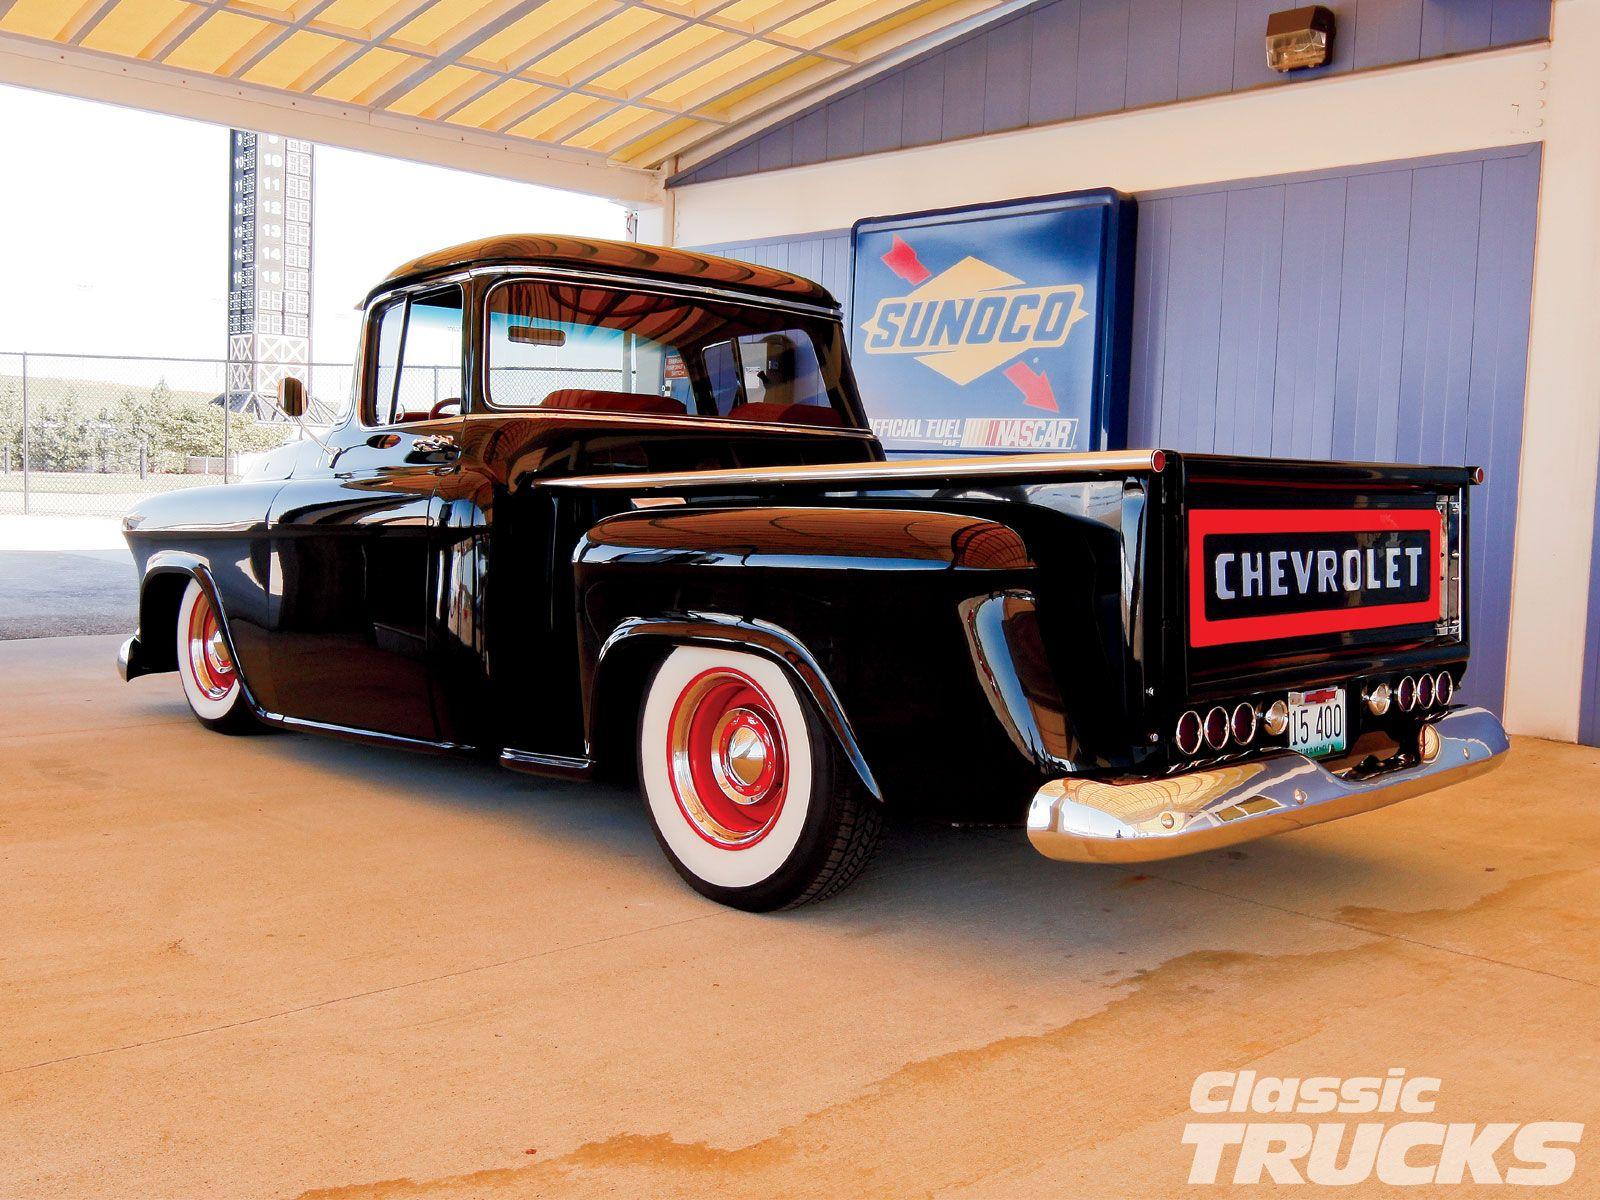 Vintage trucks 1957 chevy 3100 stepside classic trucks magazine